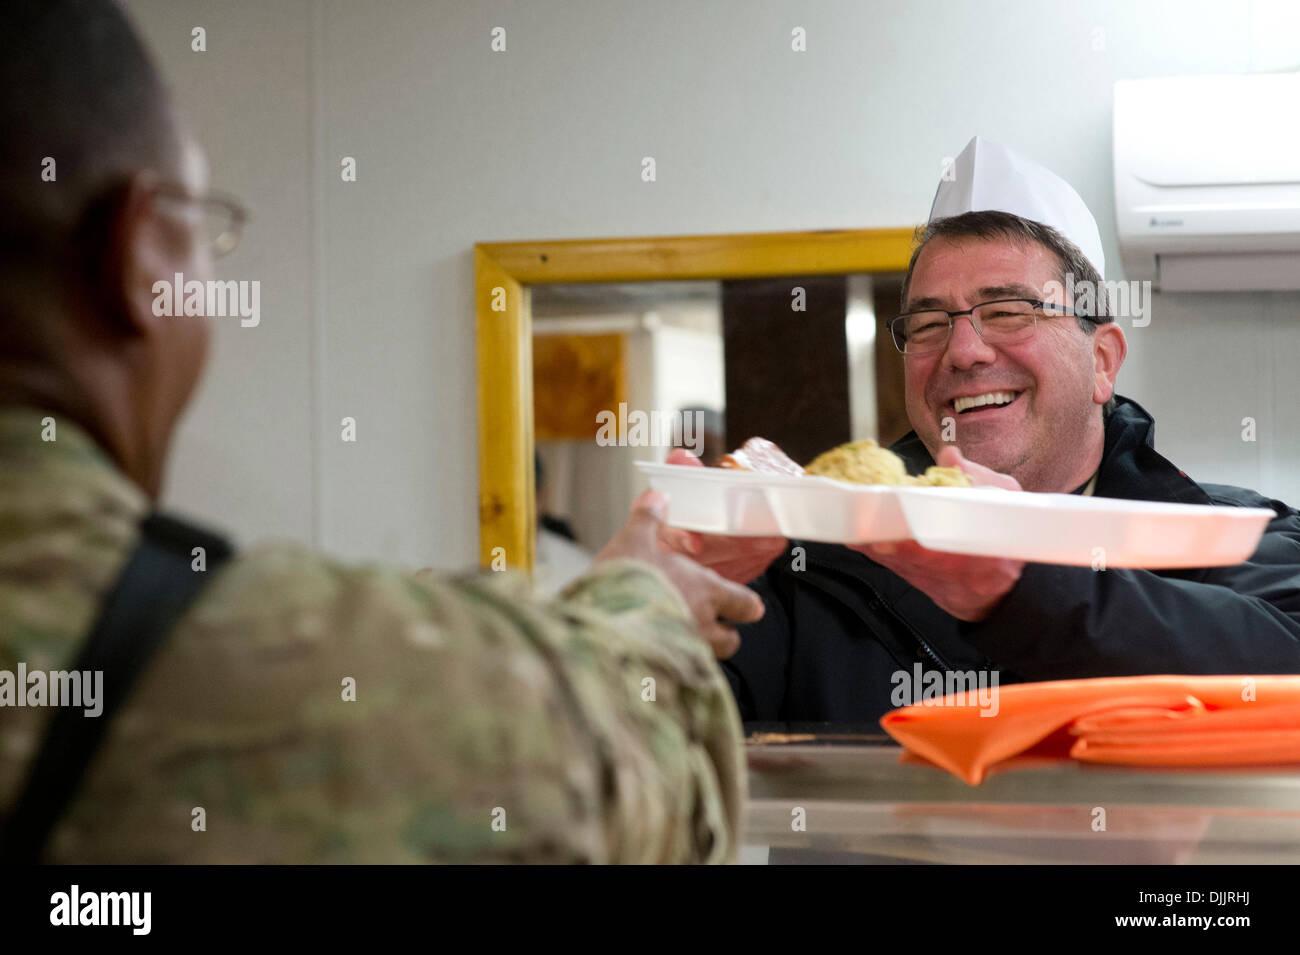 US Deputy Secretary of Defense Ashton Carter serves troops Thanksgiving dinner at Bagram Air Field November 28, 2013 in Bagram, Afghanistan. - Stock Image